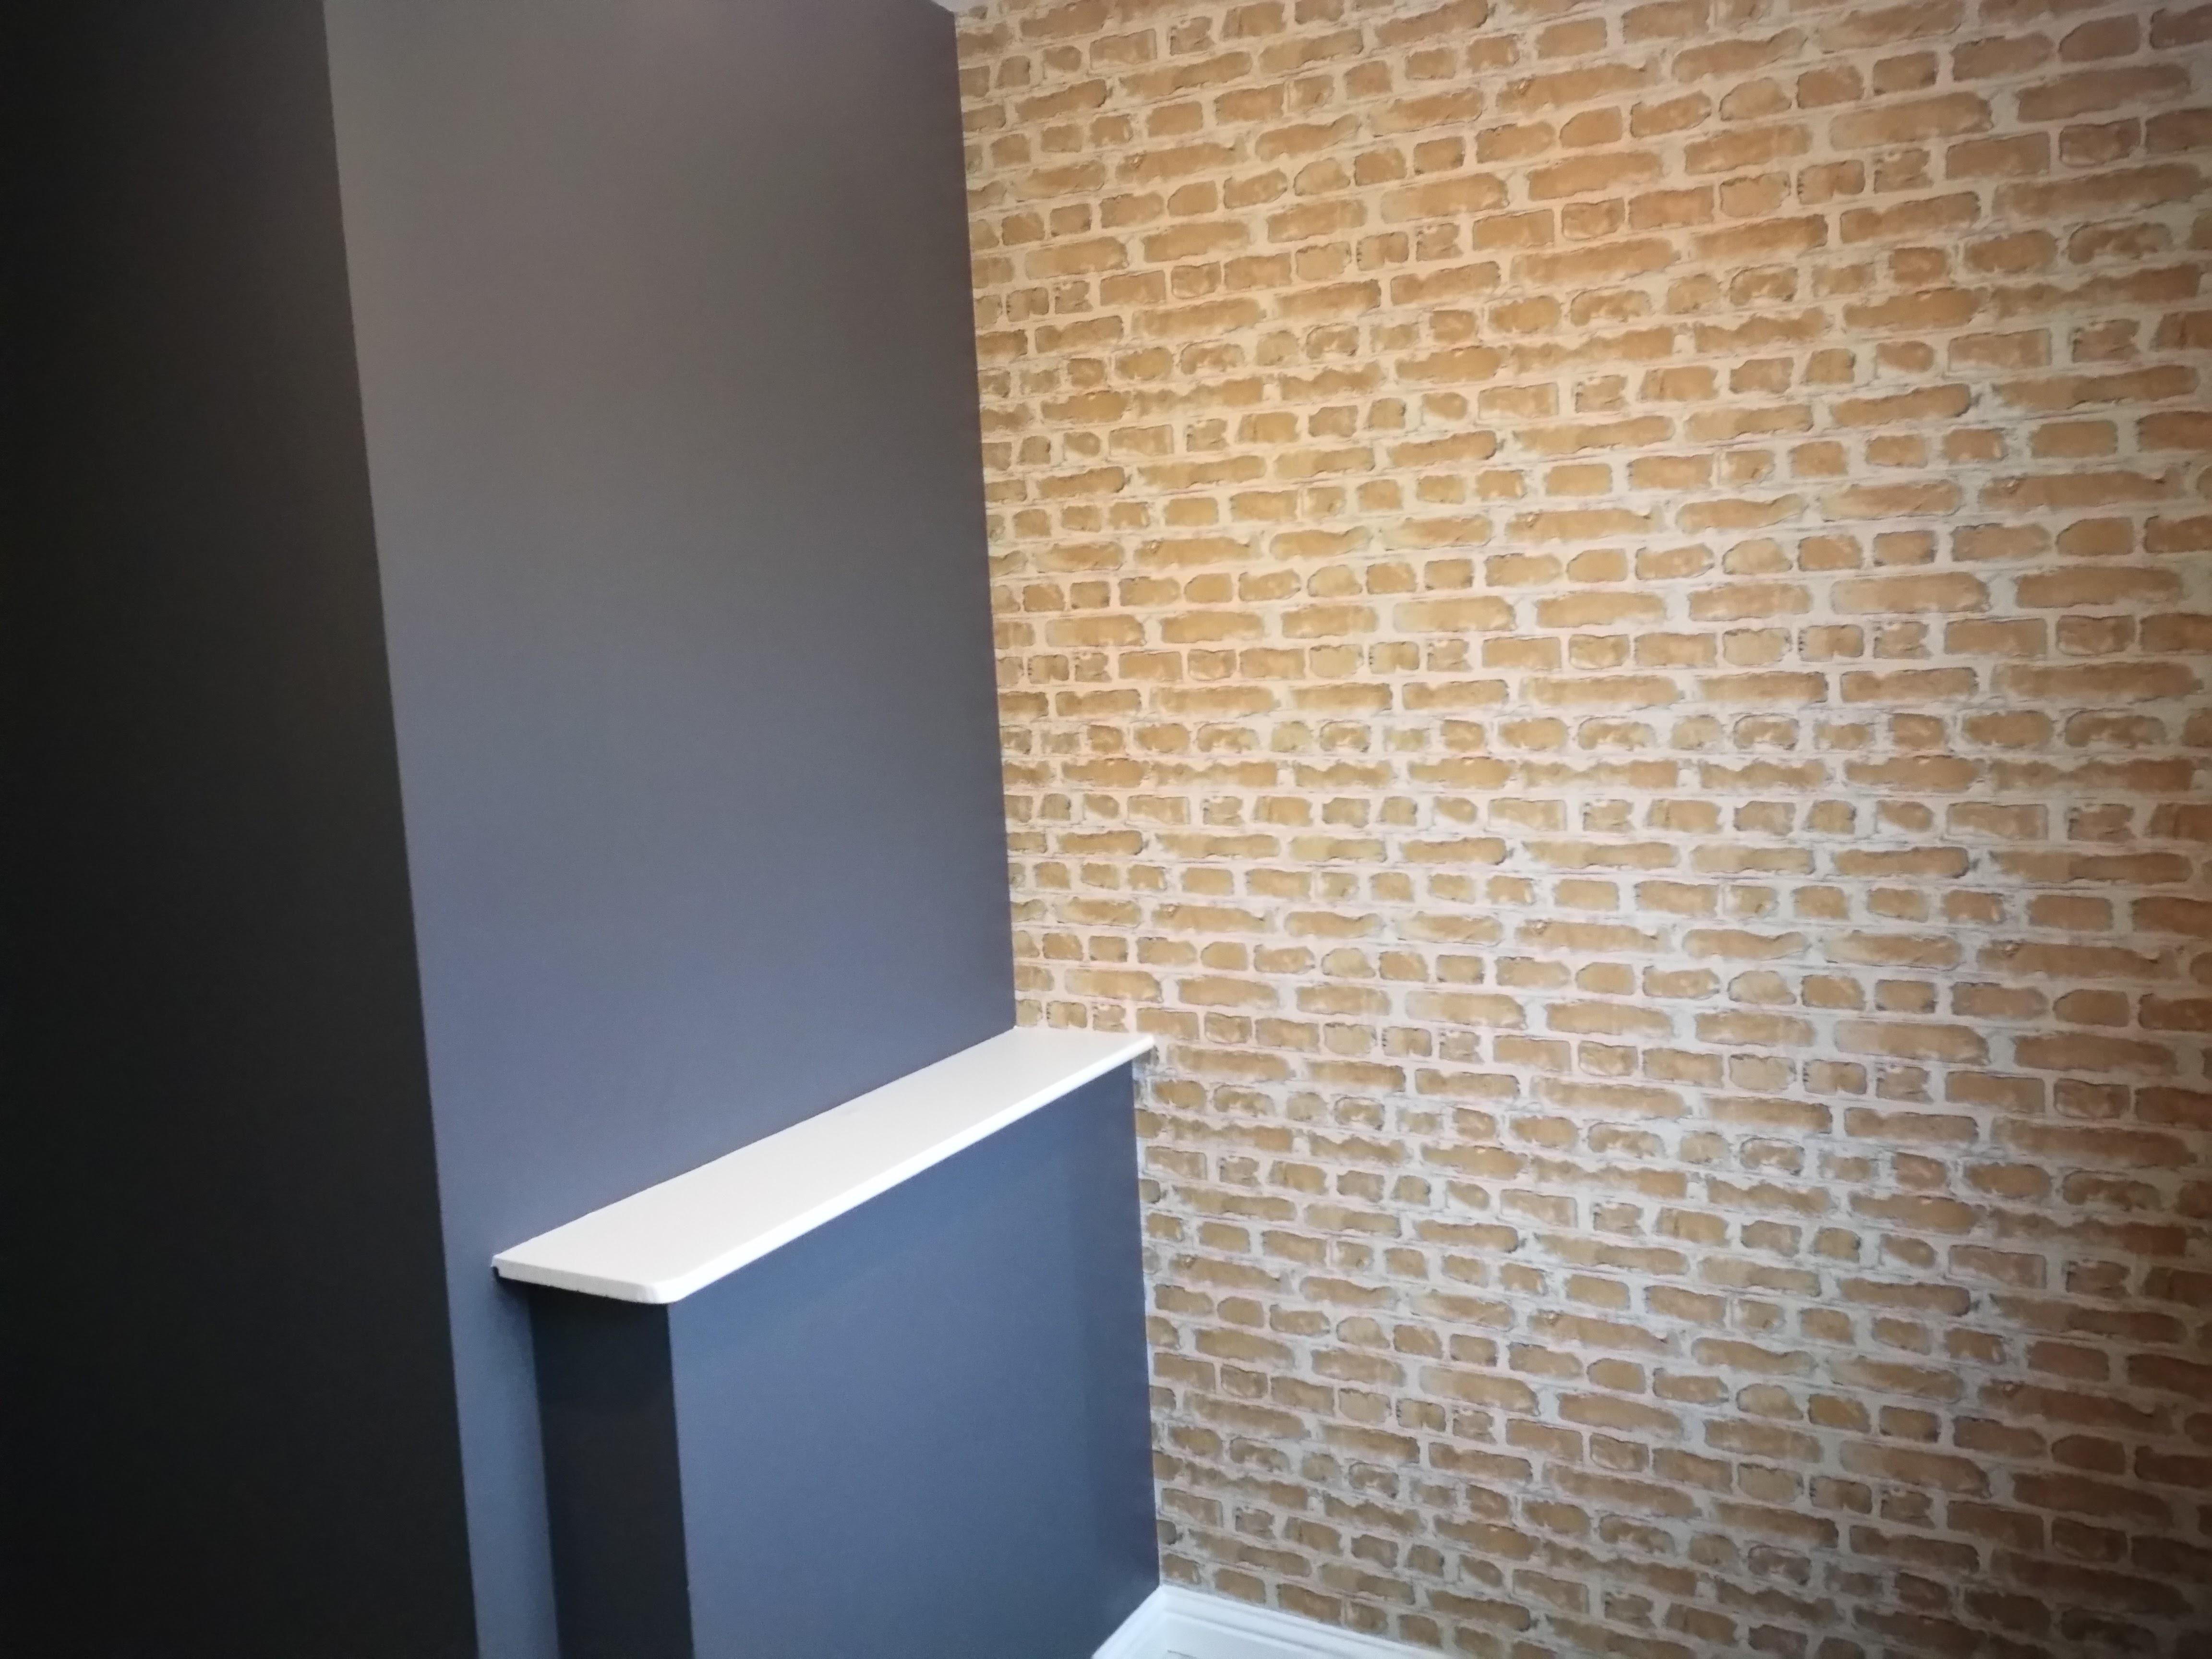 Whitehead Brick Wallpaper Bowler Hat Paint